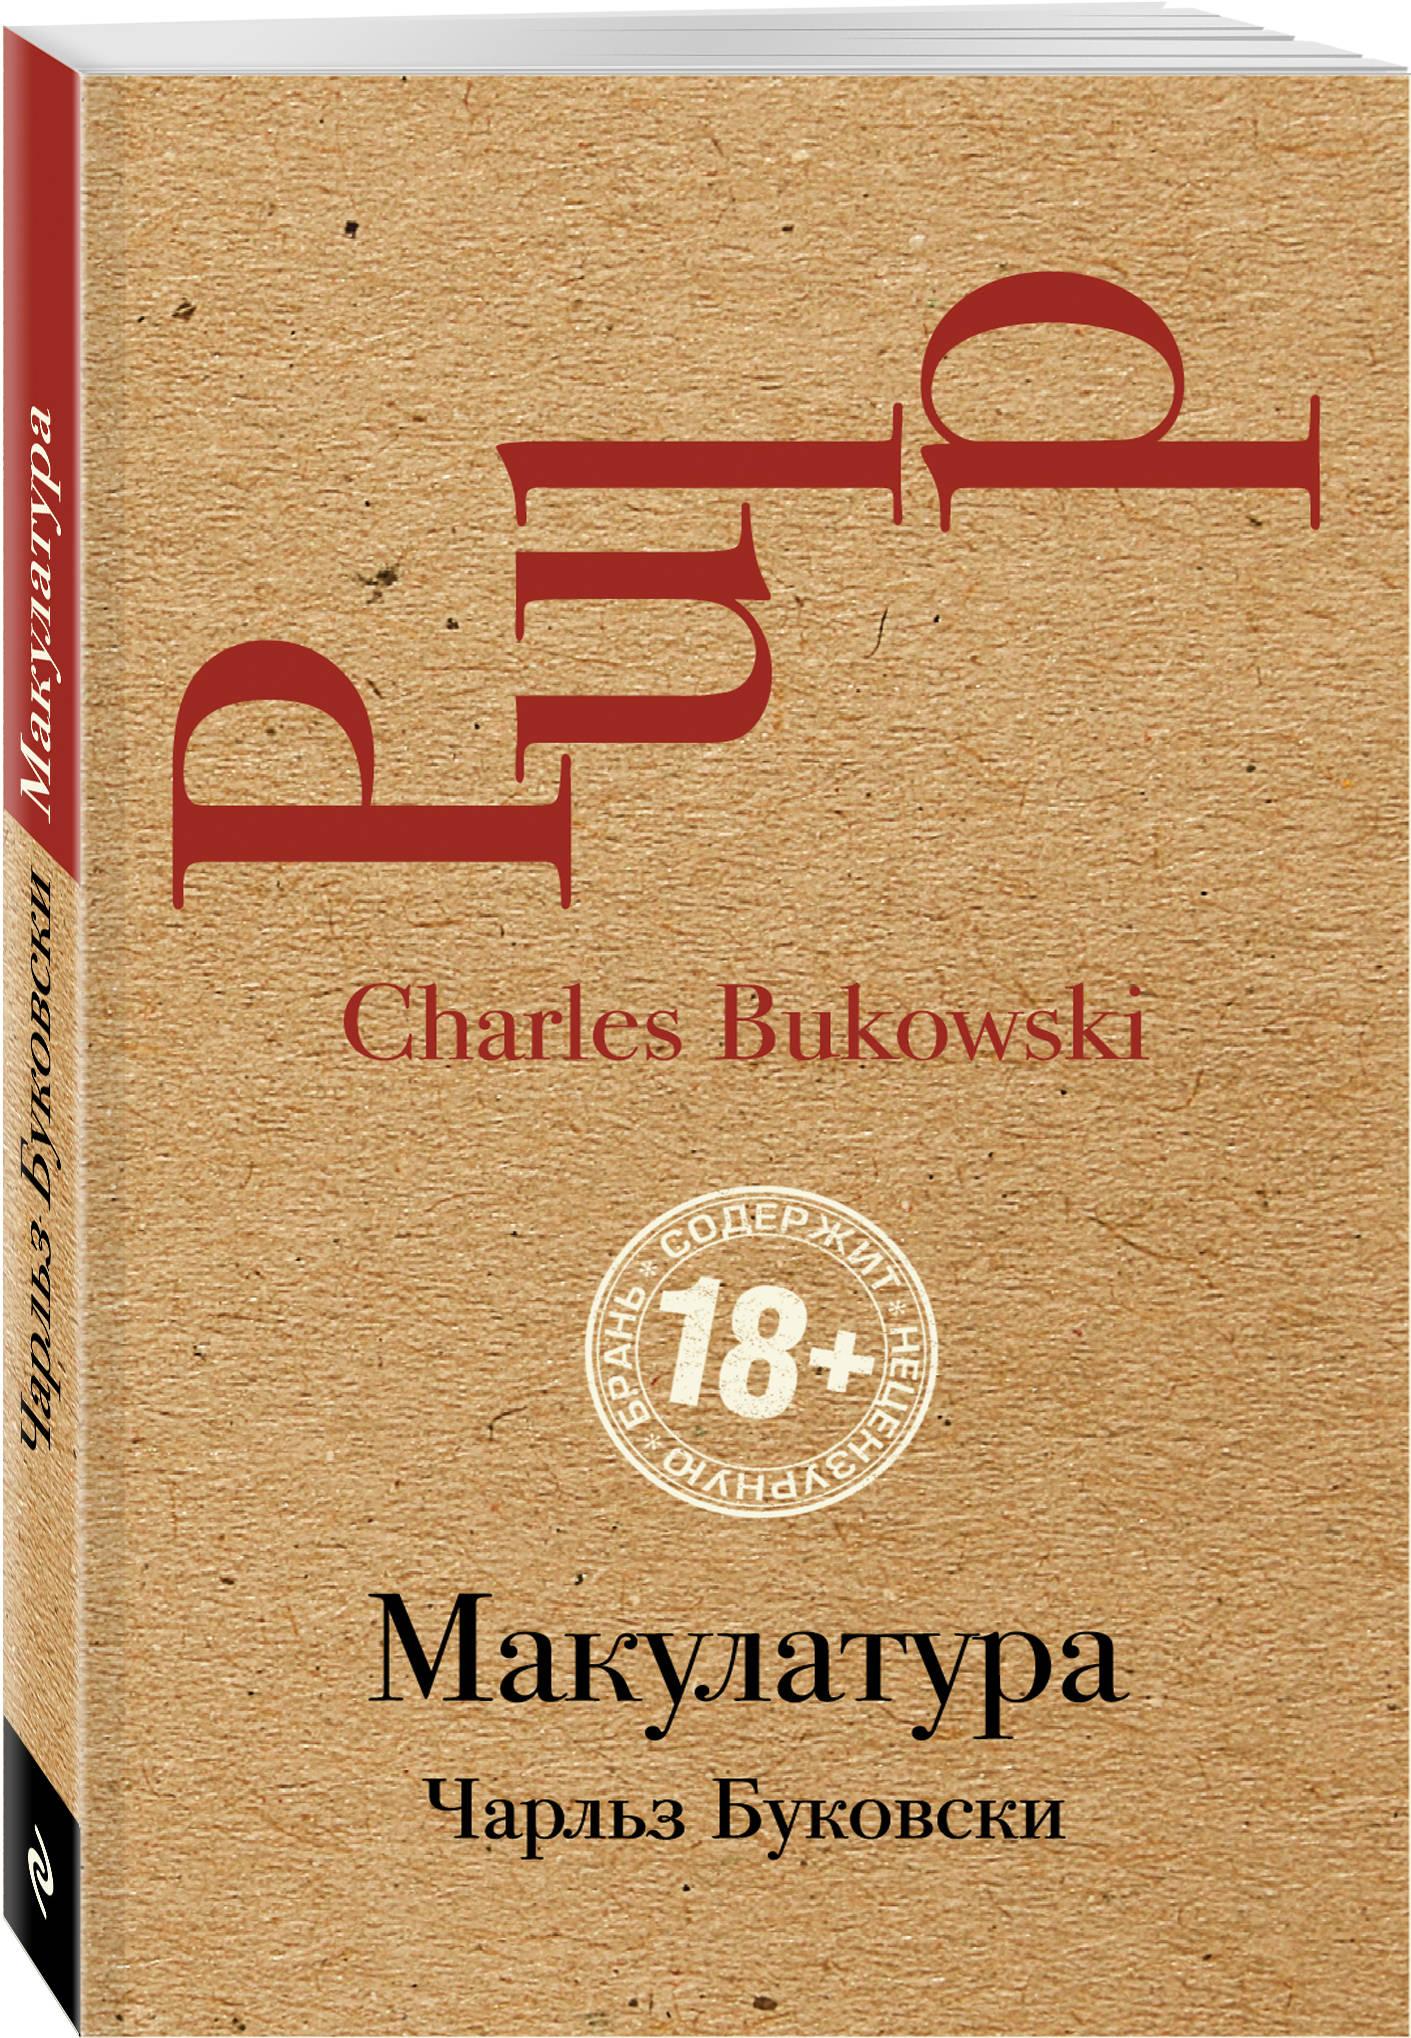 Чарльз Буковски Макулатура футболка стрэйч printio чарльз буковски charles bukowski